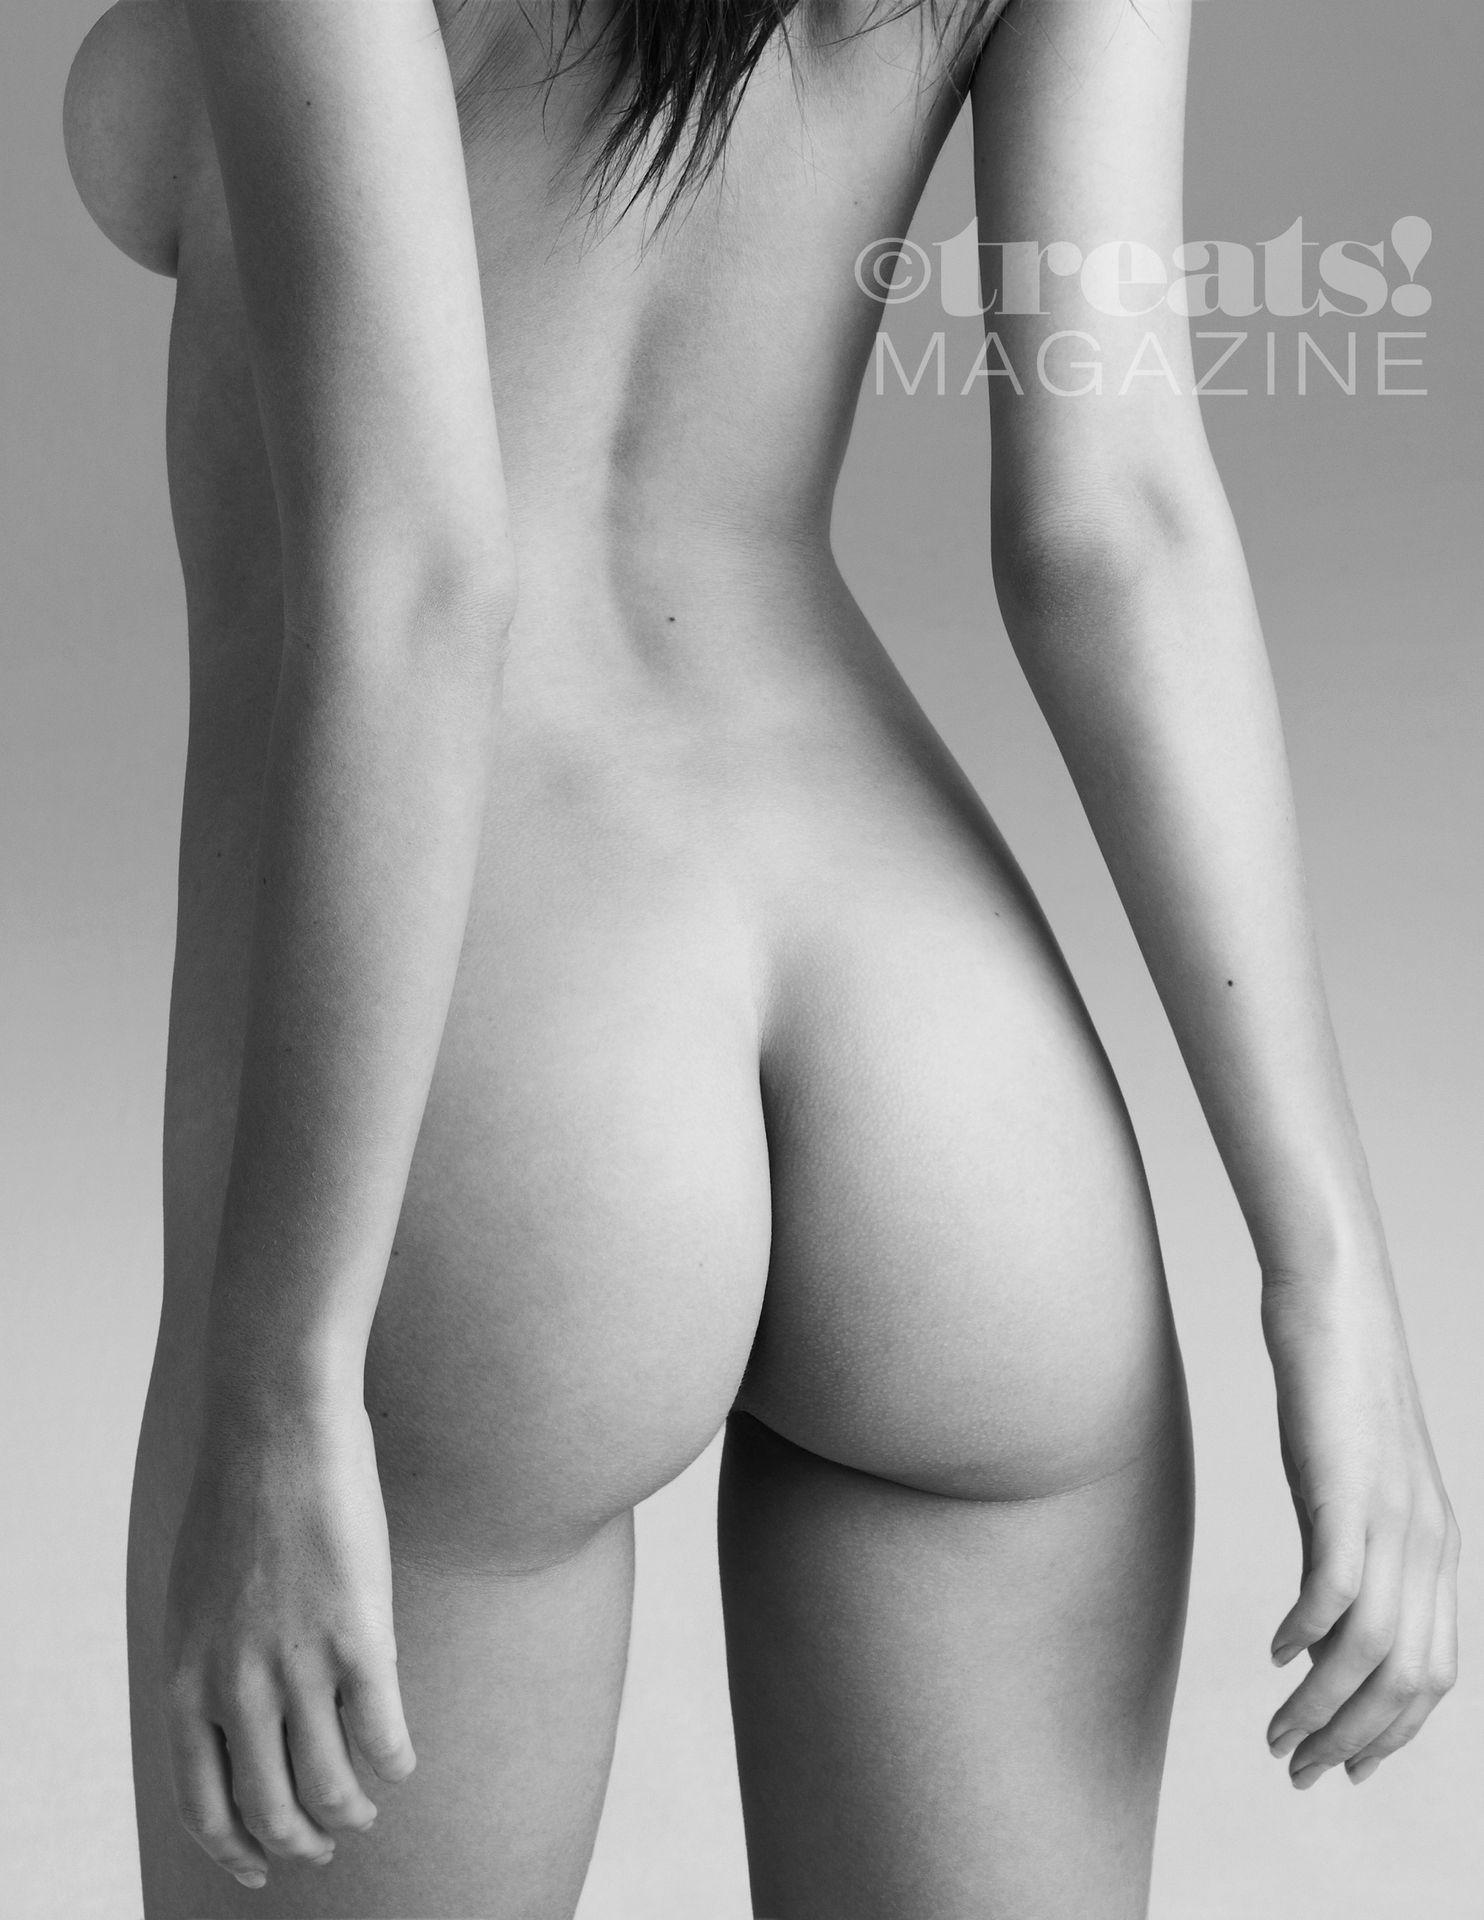 Emily-Ratajkowski-Nude-The-Fappening-Blog-1